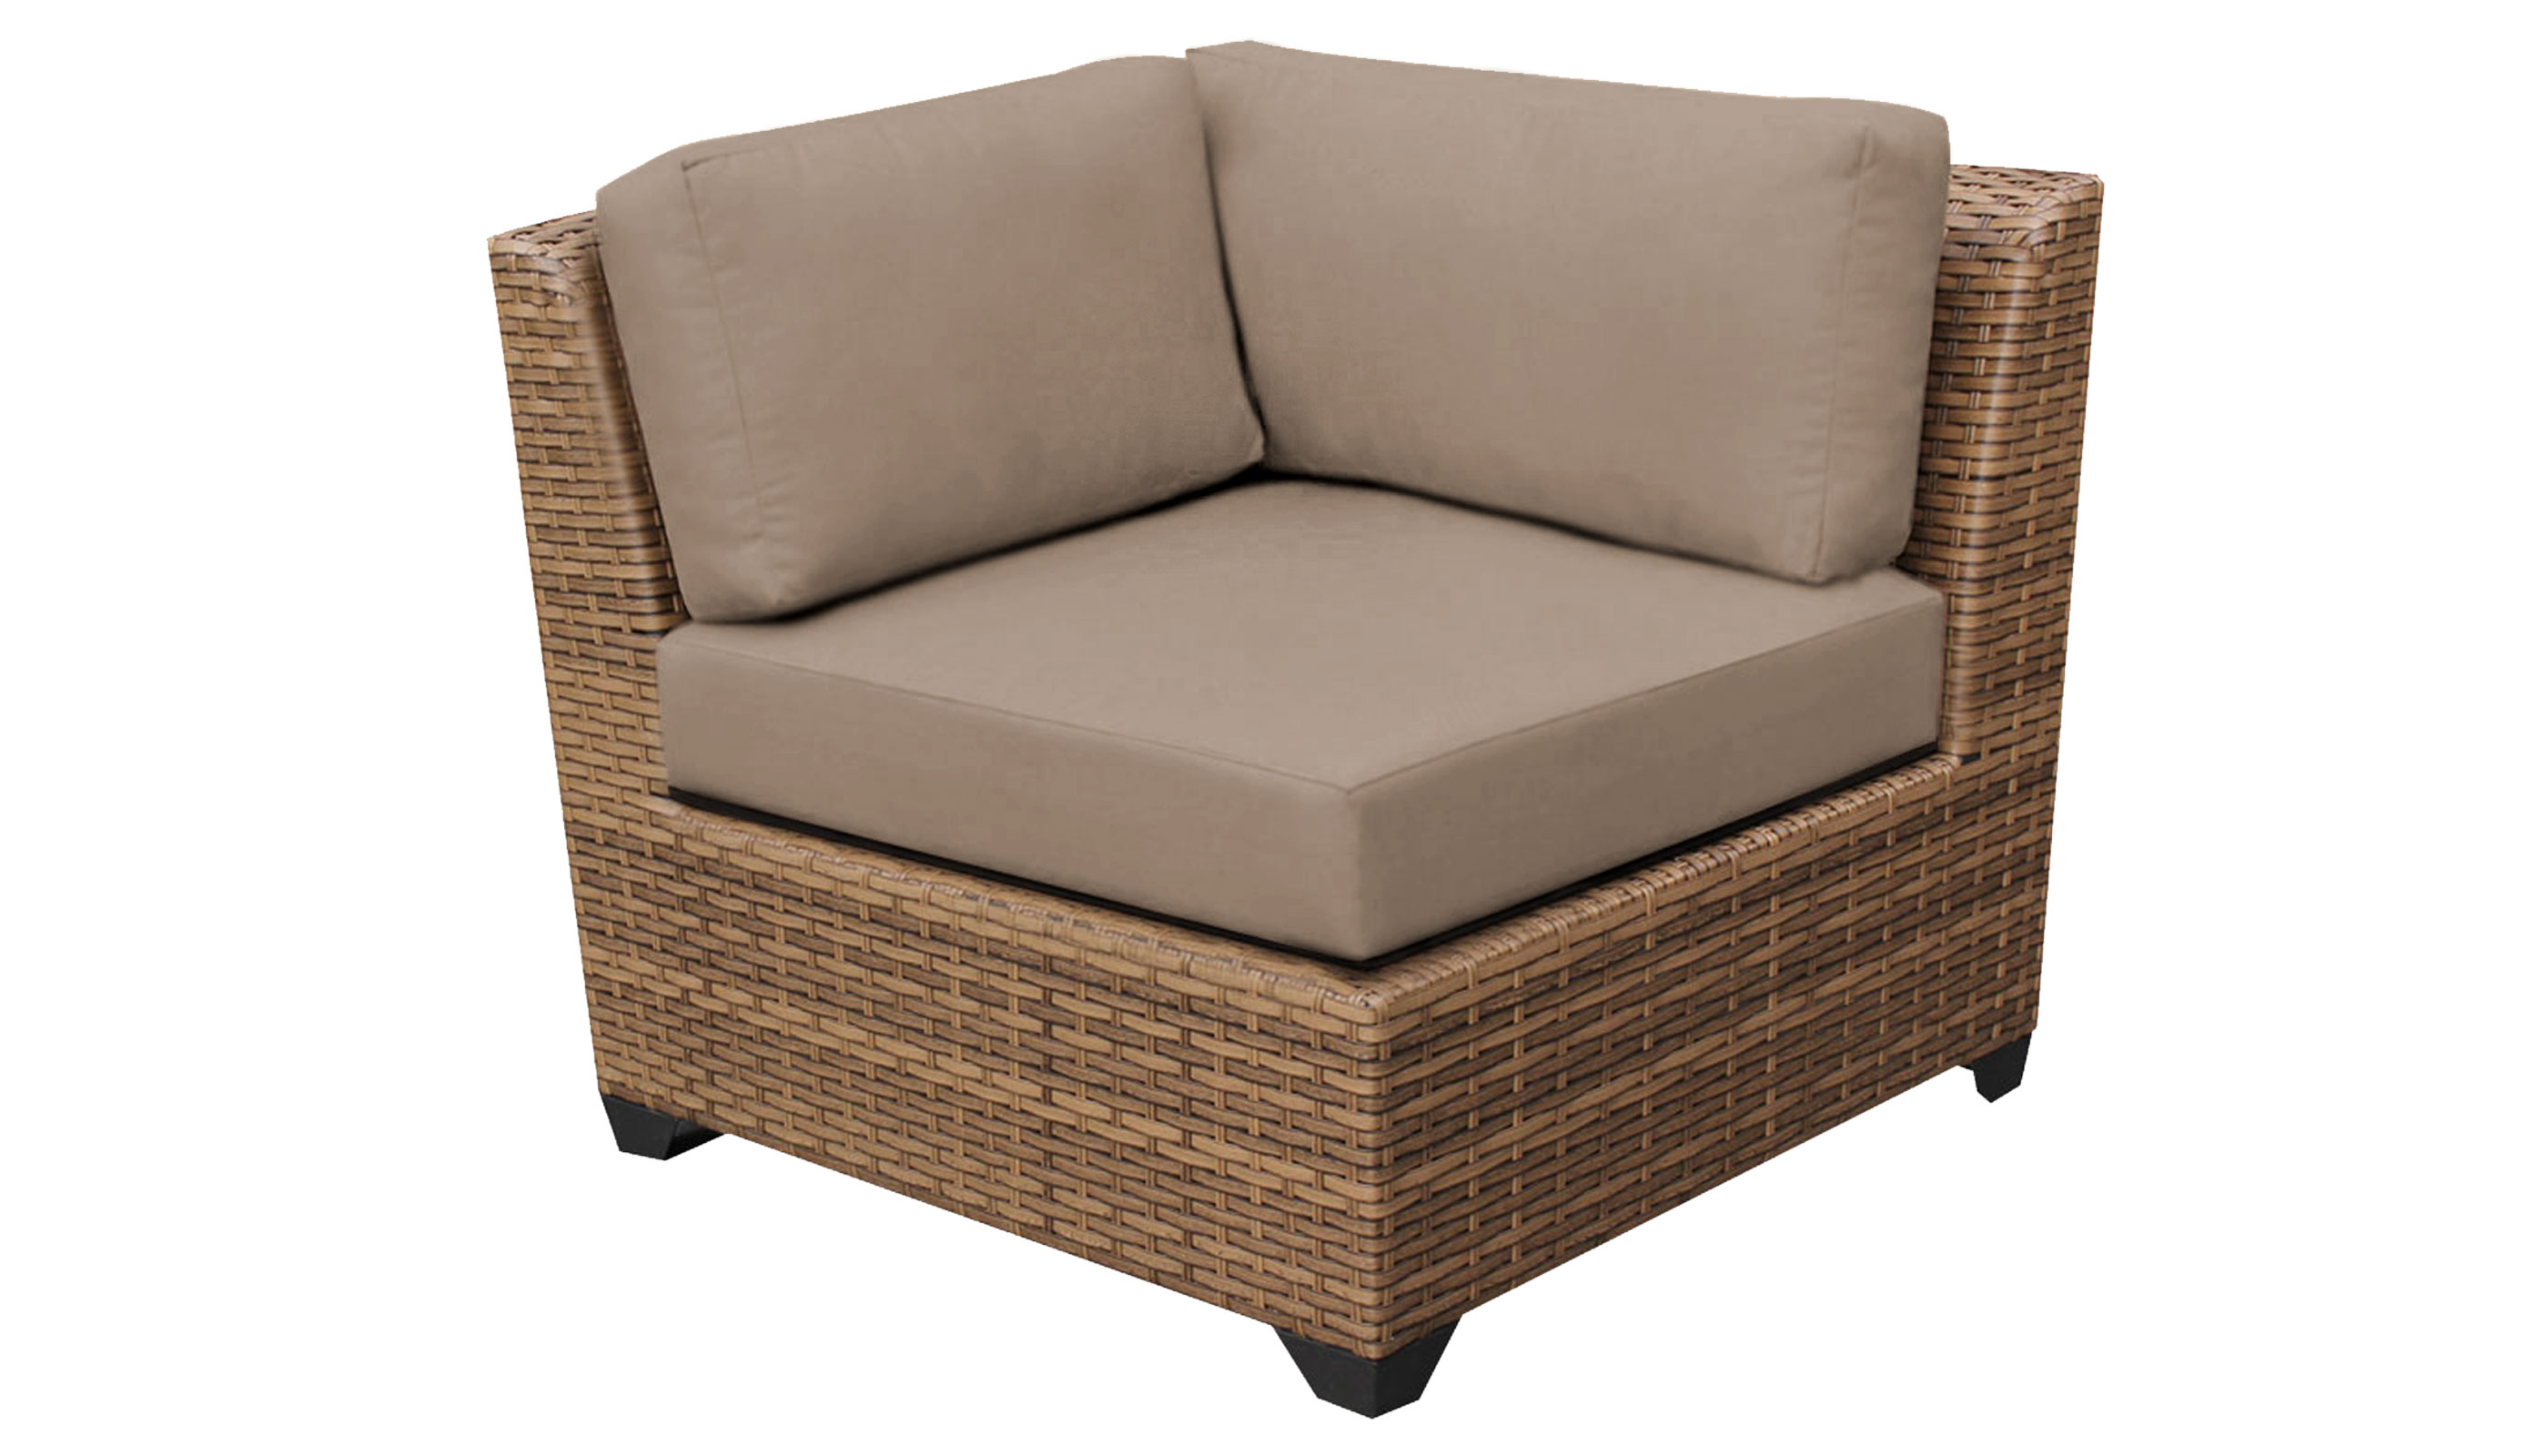 Brilliant Laguna 4 Piece Outdoor Wicker Patio Furniture Set 04A Theyellowbook Wood Chair Design Ideas Theyellowbookinfo